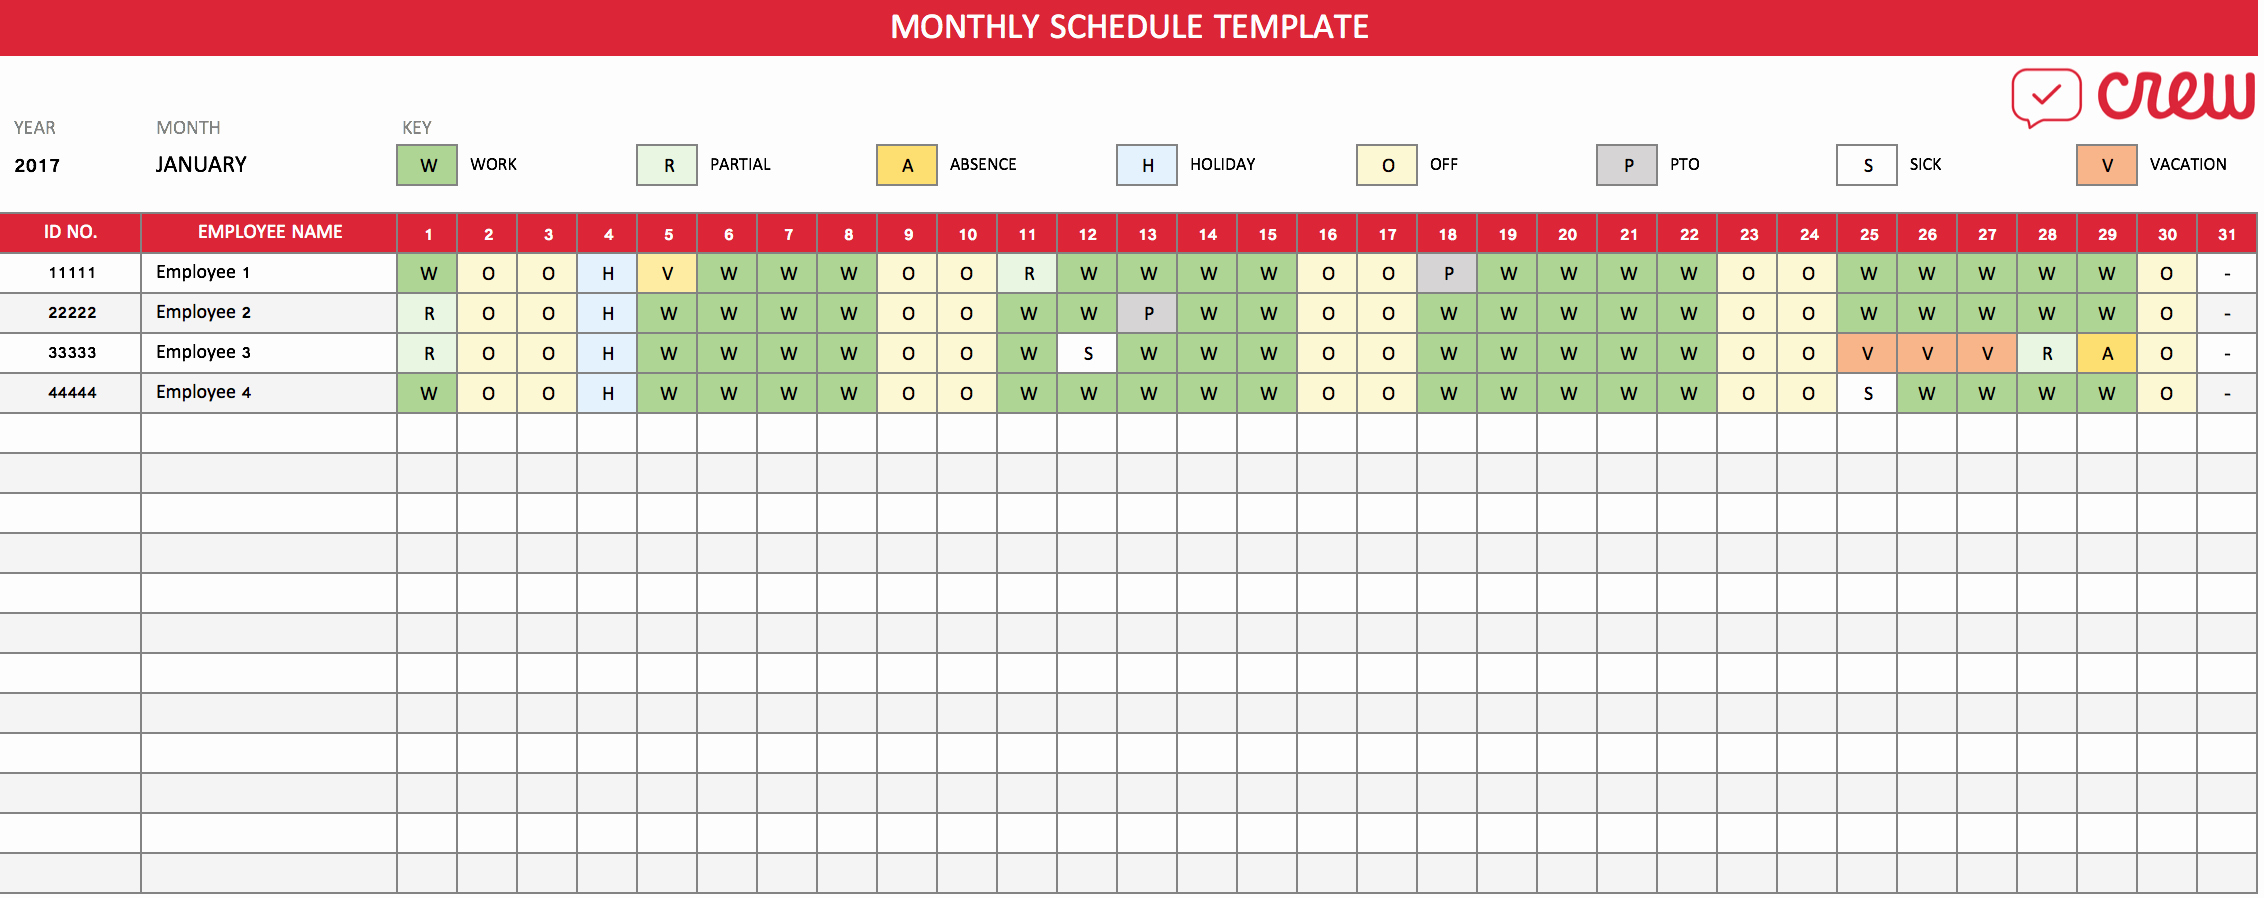 Employee Monthly Work Schedule Template New Free Monthly Work Schedule Template Crew